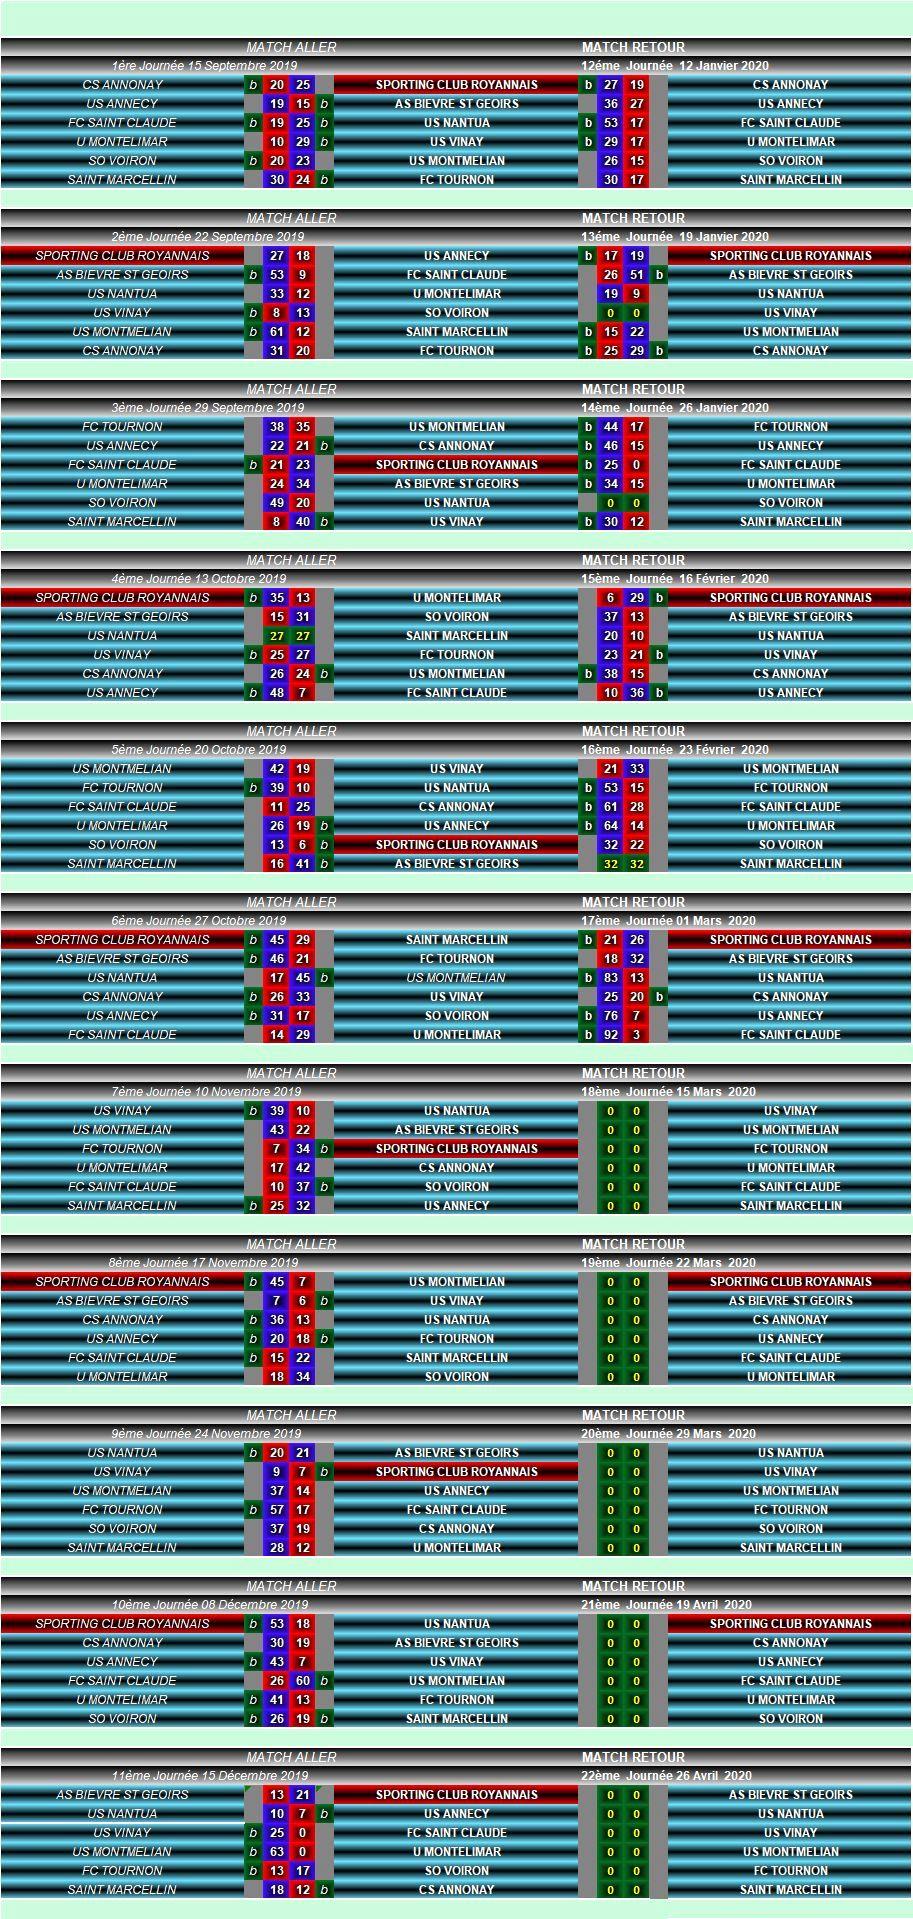 Copie de Calendrier Séniors 2